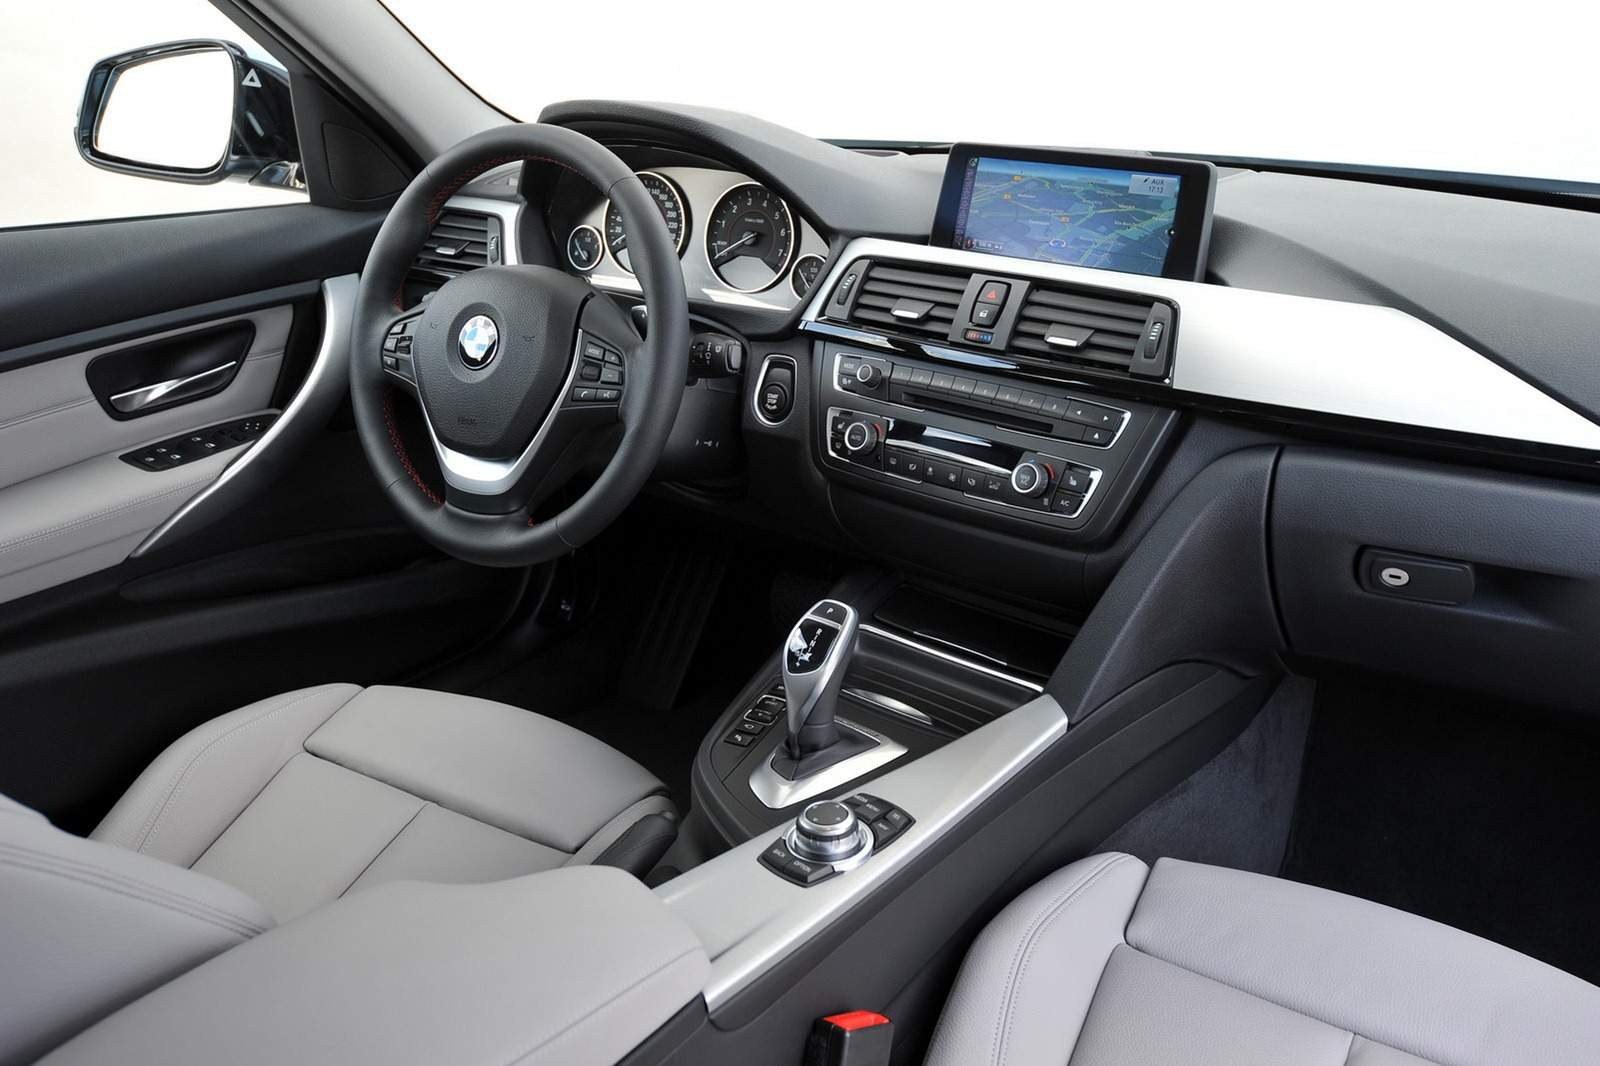 BMW F30 3 series interior